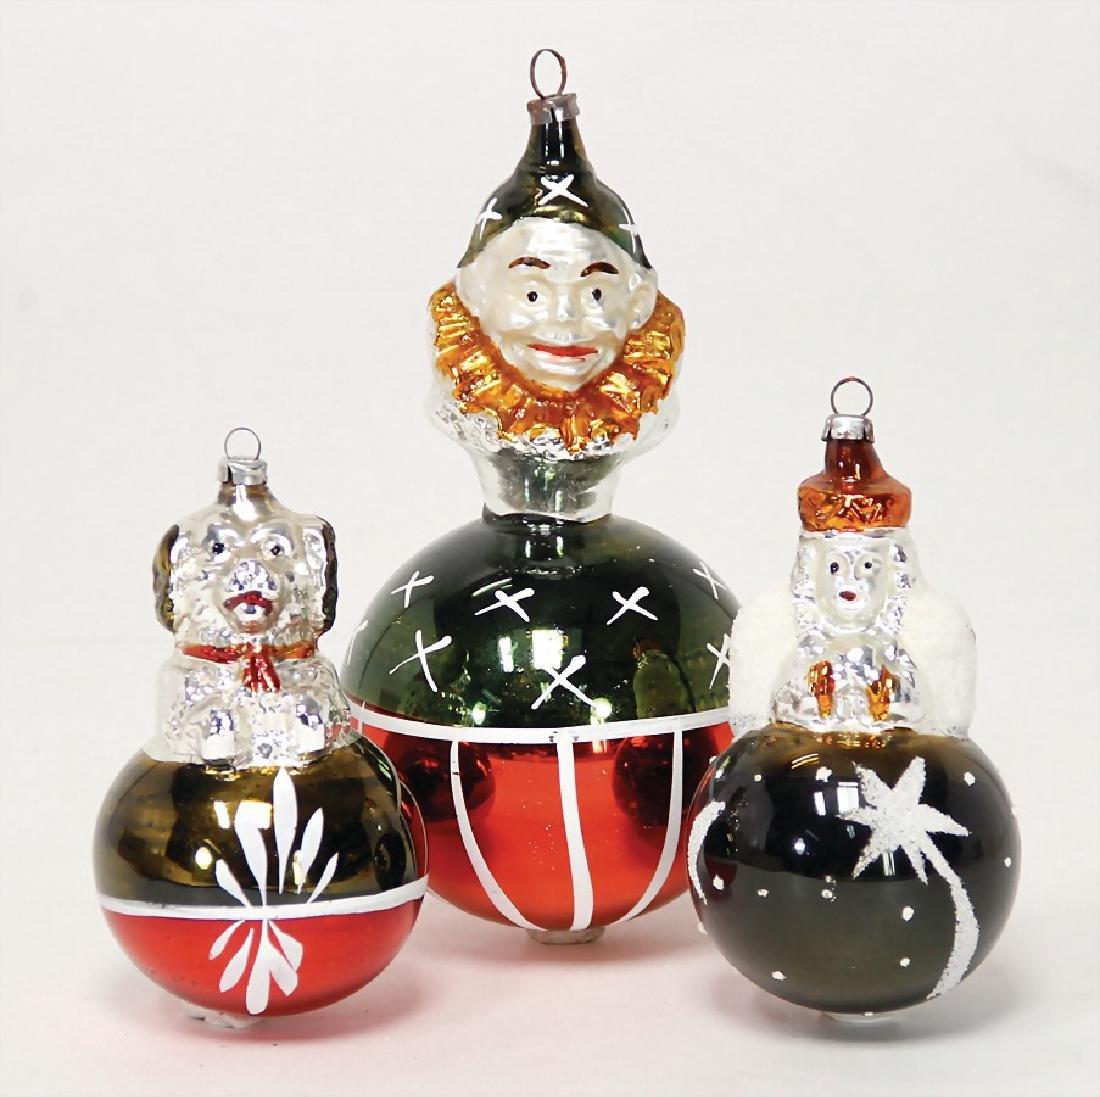 3 pieces Christmas tree decoration, mirror glass, ball